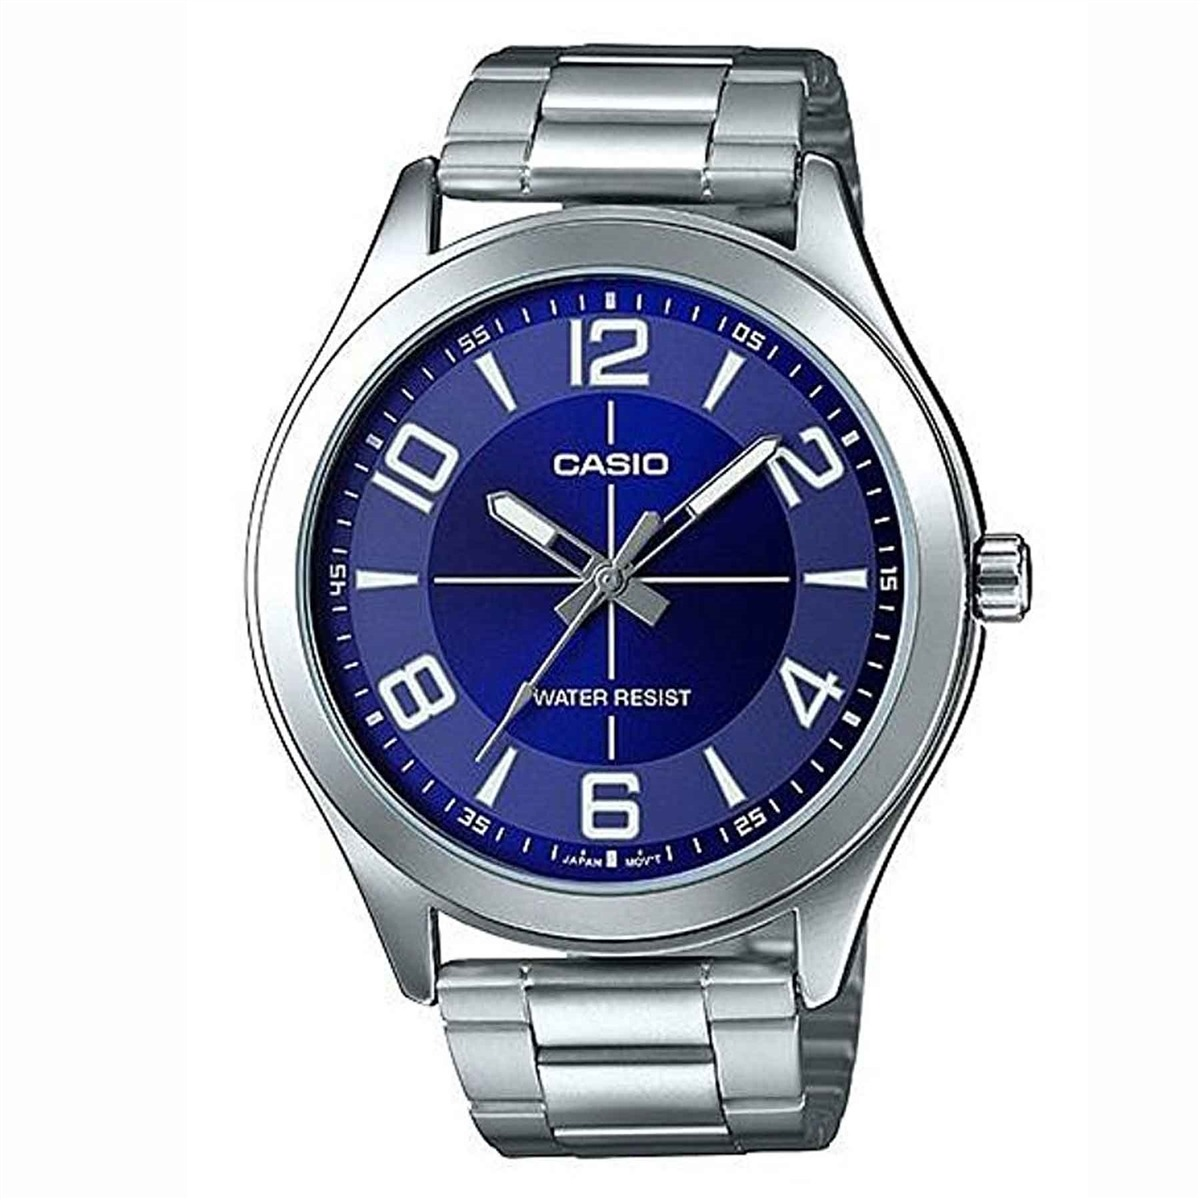 cd6955989c8 Relógio Casio Collection Analógico Masculino Mtp-vx01d-2bu - R  175 ...